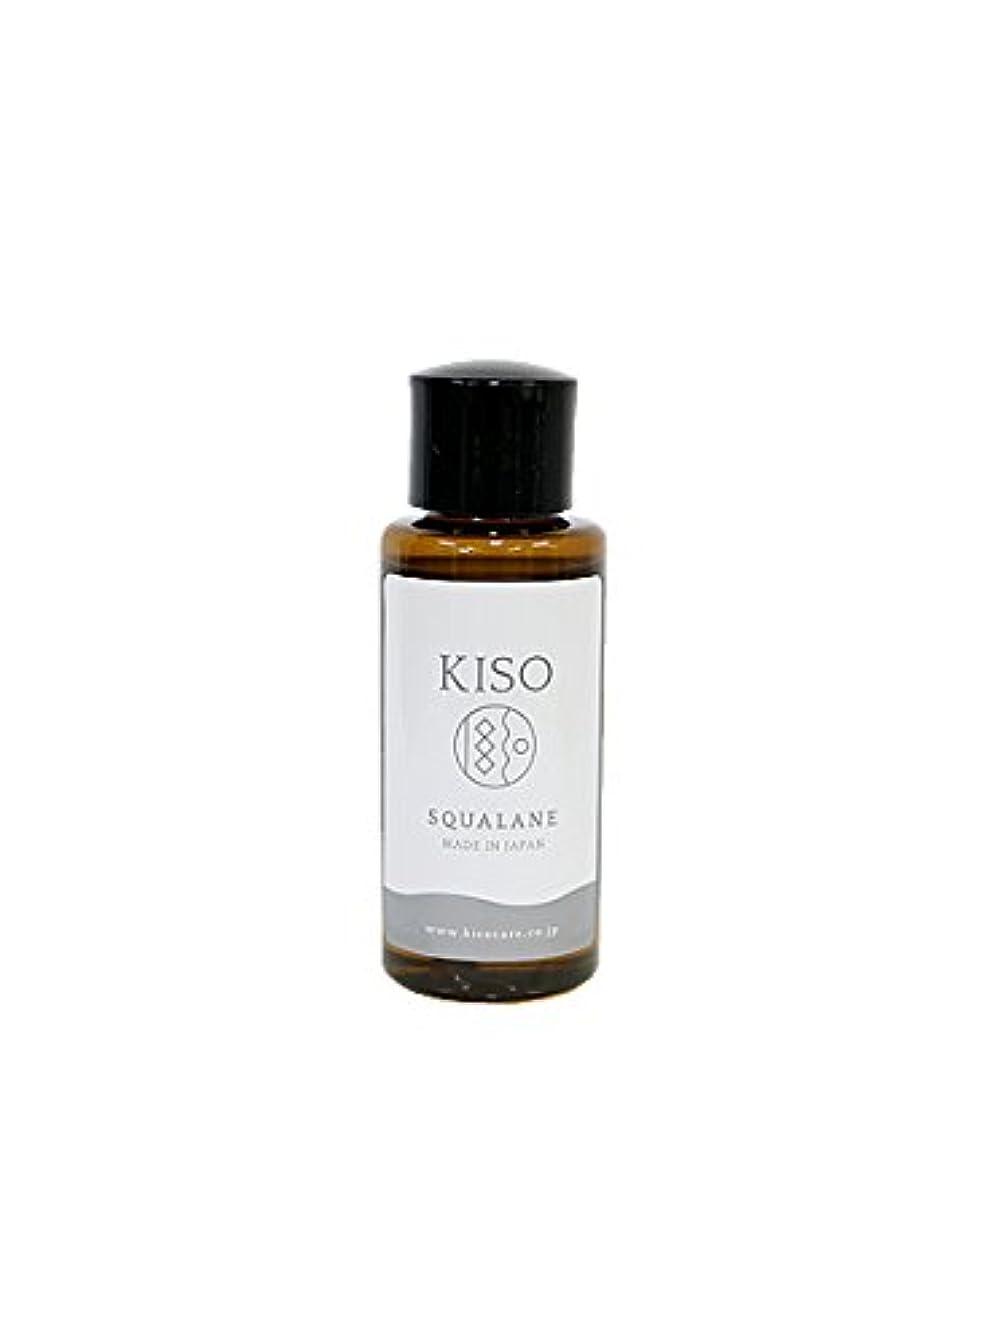 KISO 高純度 【スクワラン50mL】 100% 深海ザメ肝油/原液/オイル/保湿/低刺激/敏感肌/普通肌/ベビーオイル